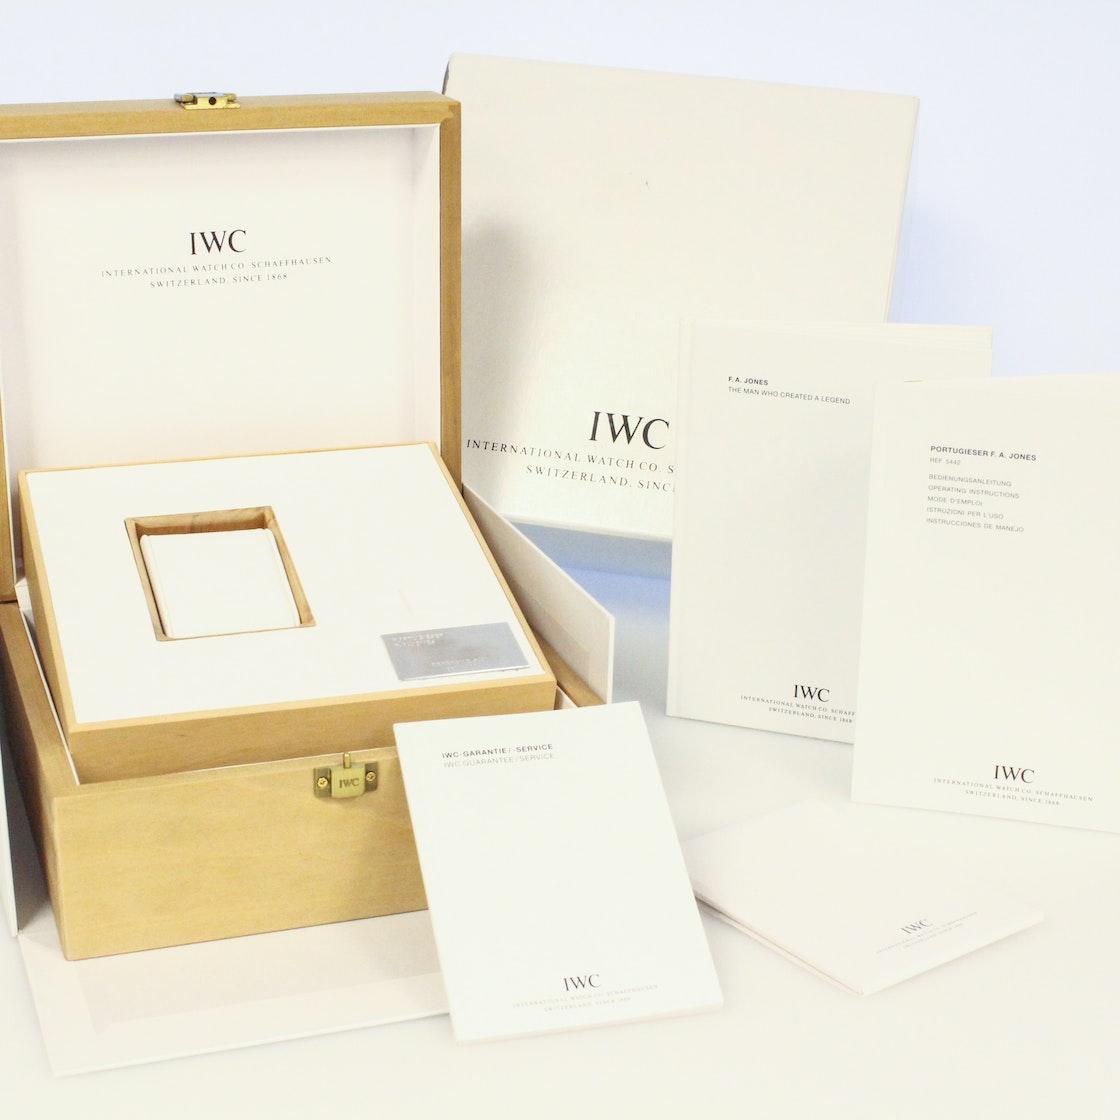 IWC Portuguese F.A. Jones Limited Edition IW5442-01